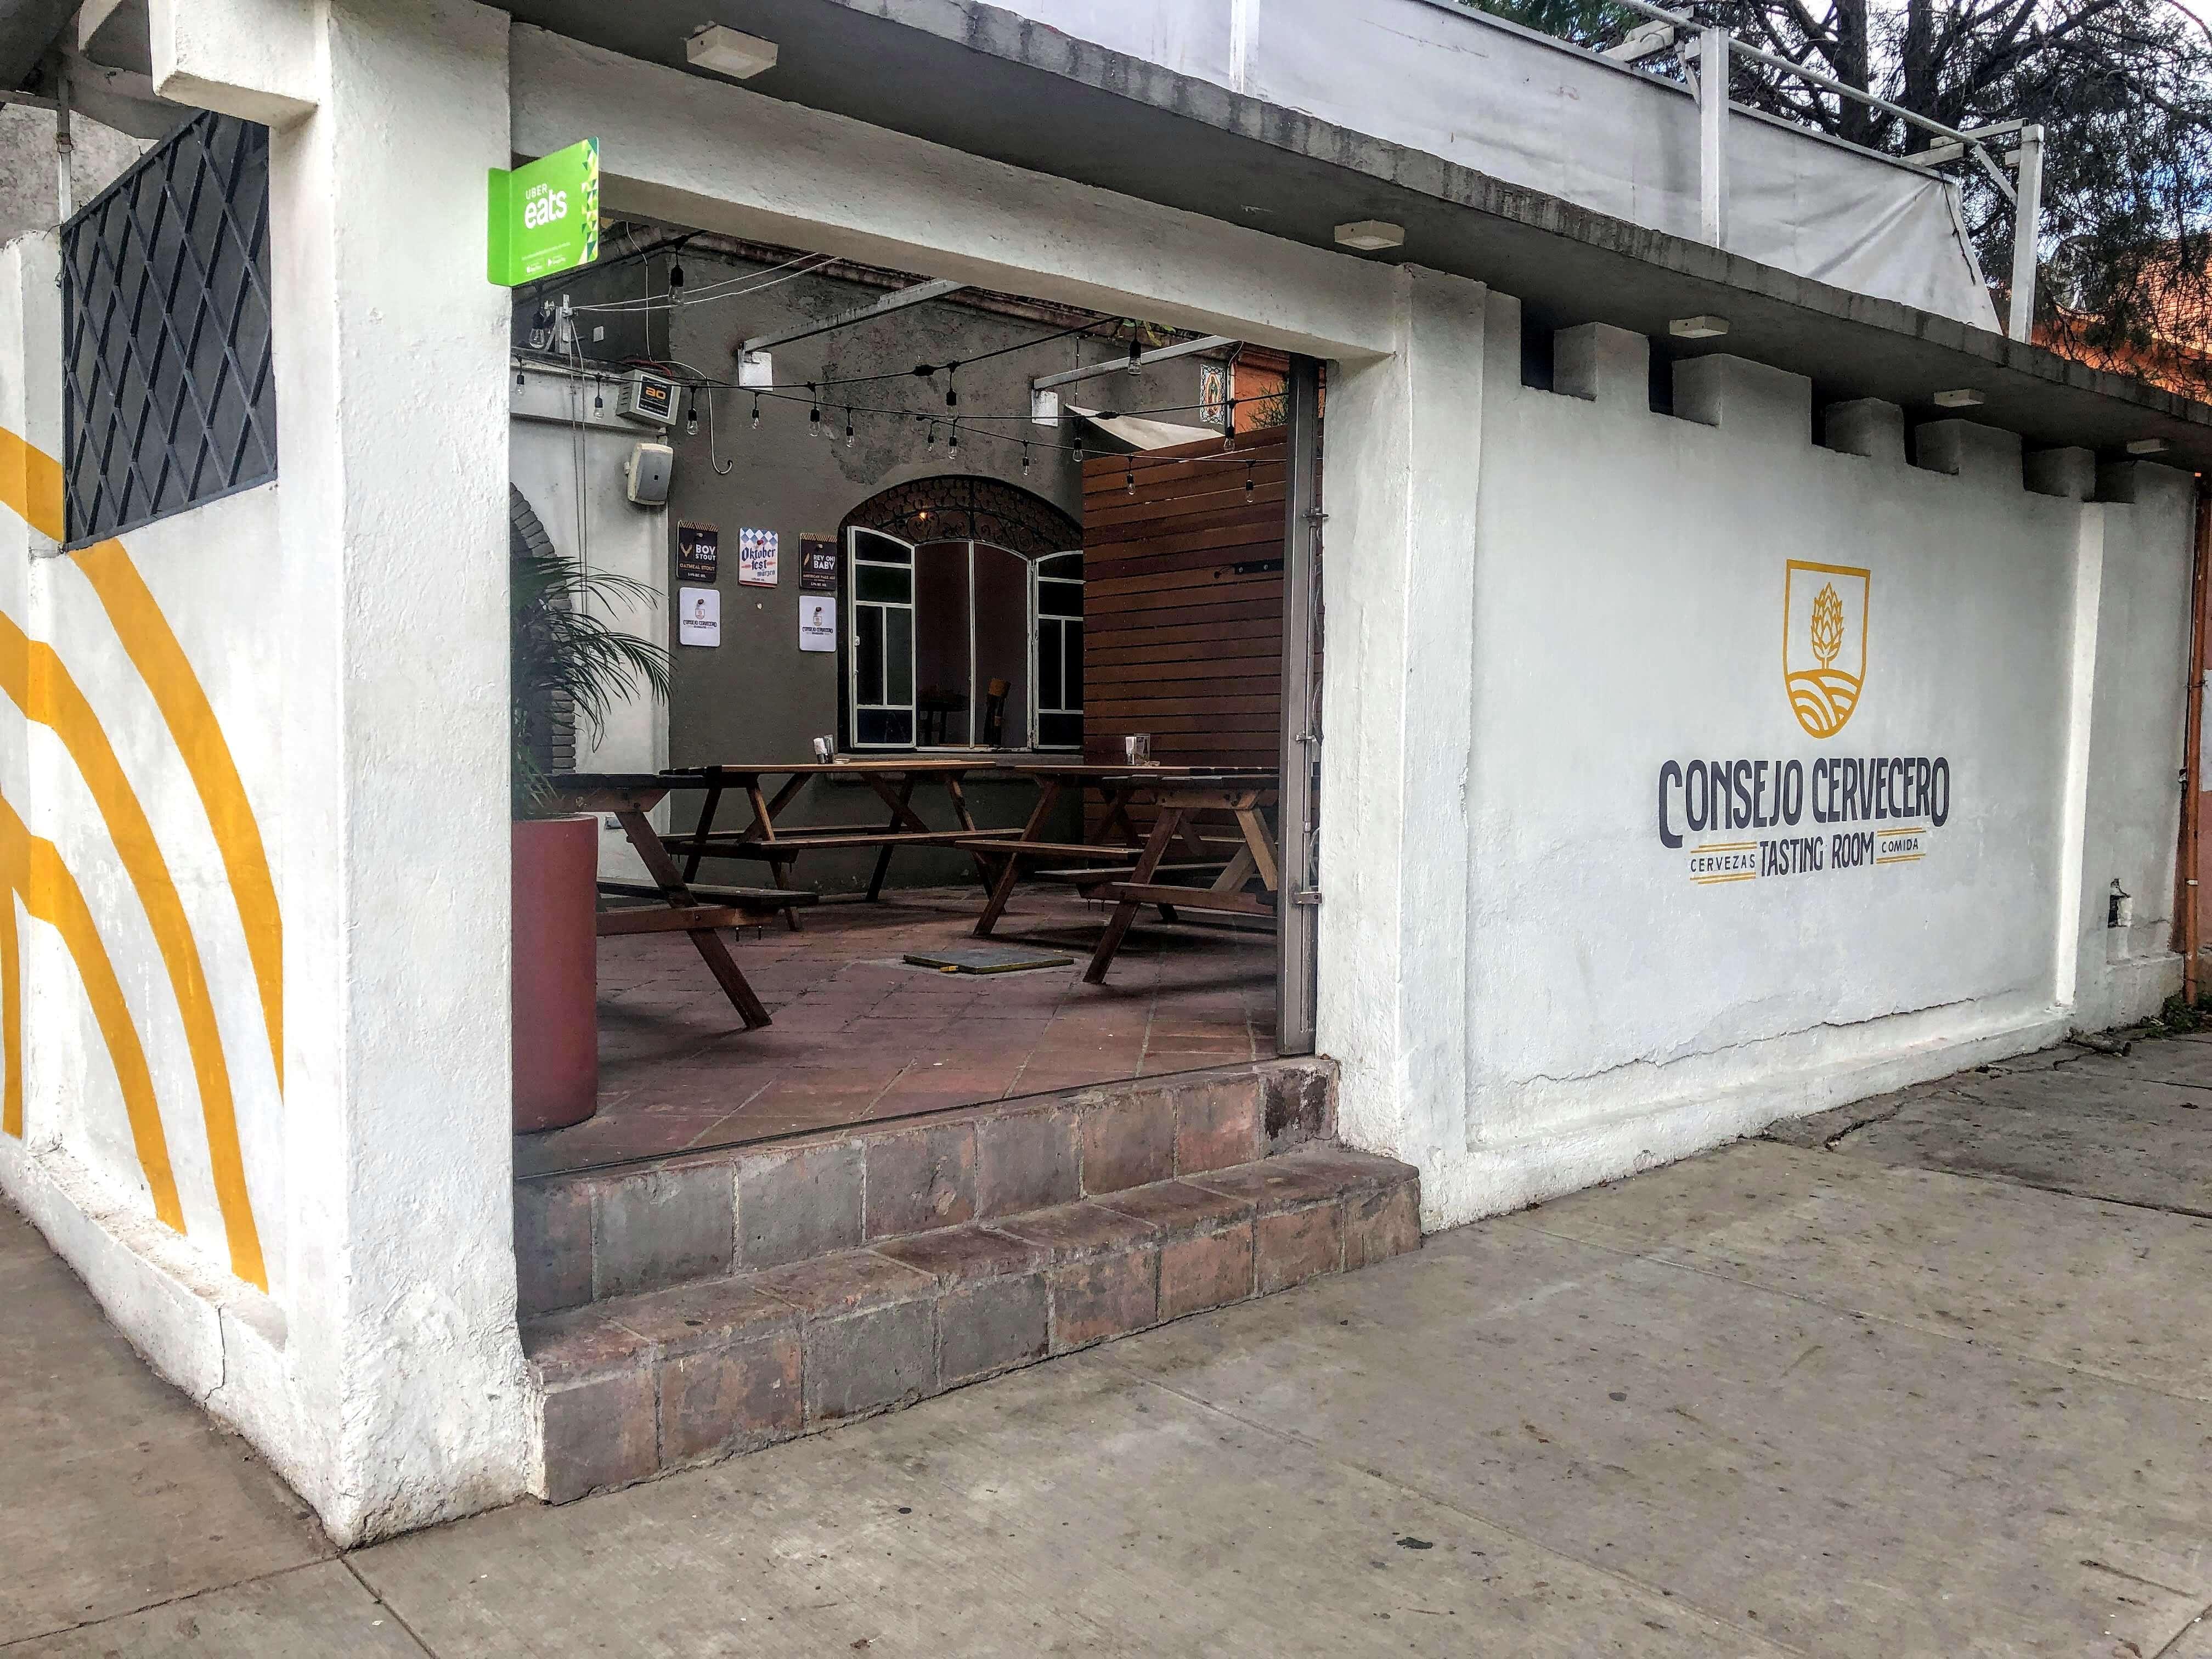 Consejo Cervecero brewery in Oaxaca